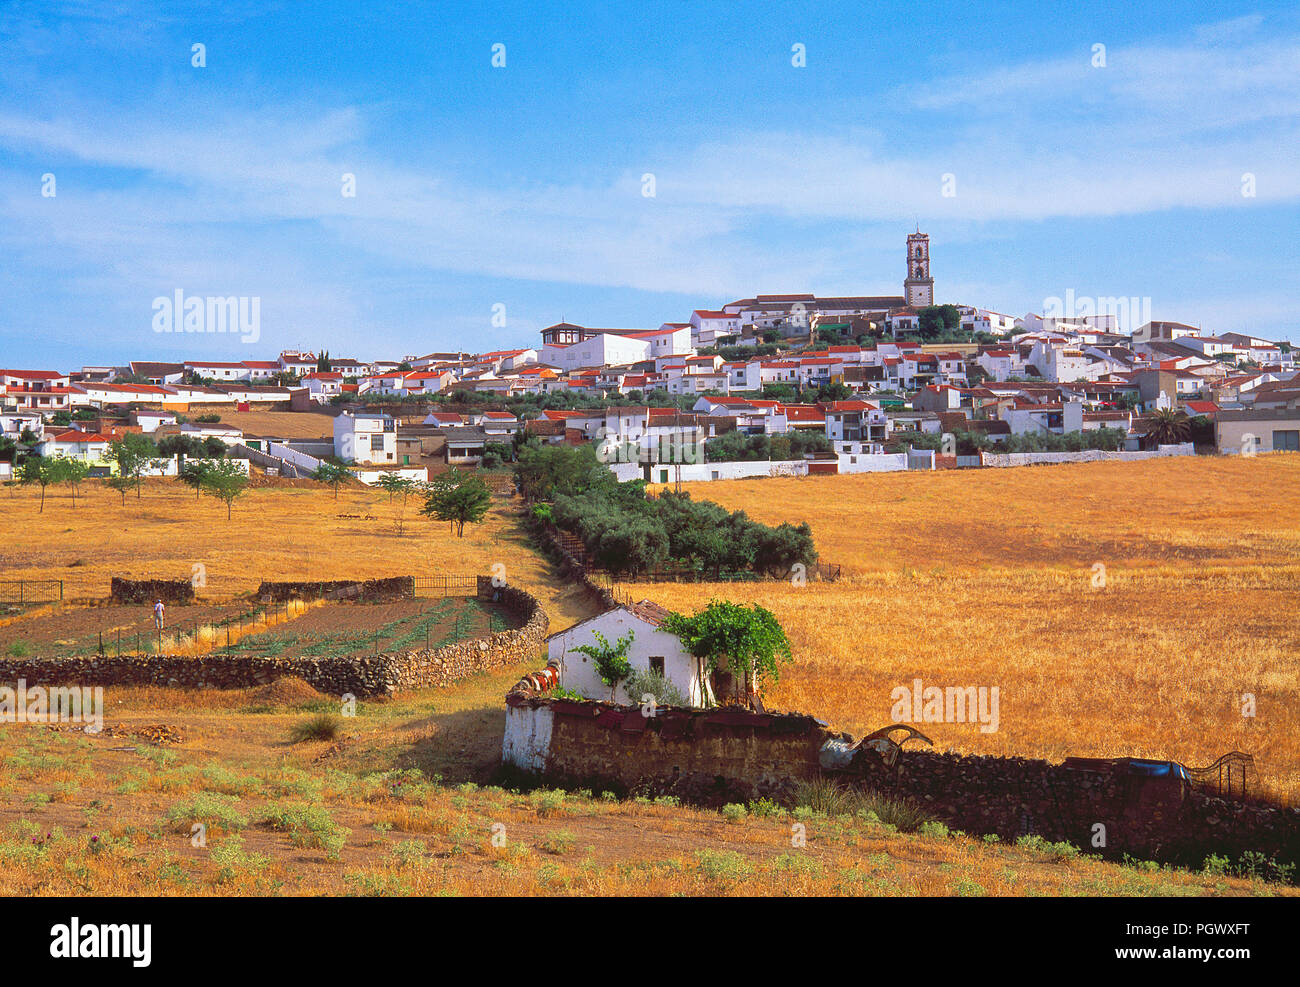 Übersicht. Fuenteobejuna, Provinz Córdoba, Andalusien, Spanien. Stockbild